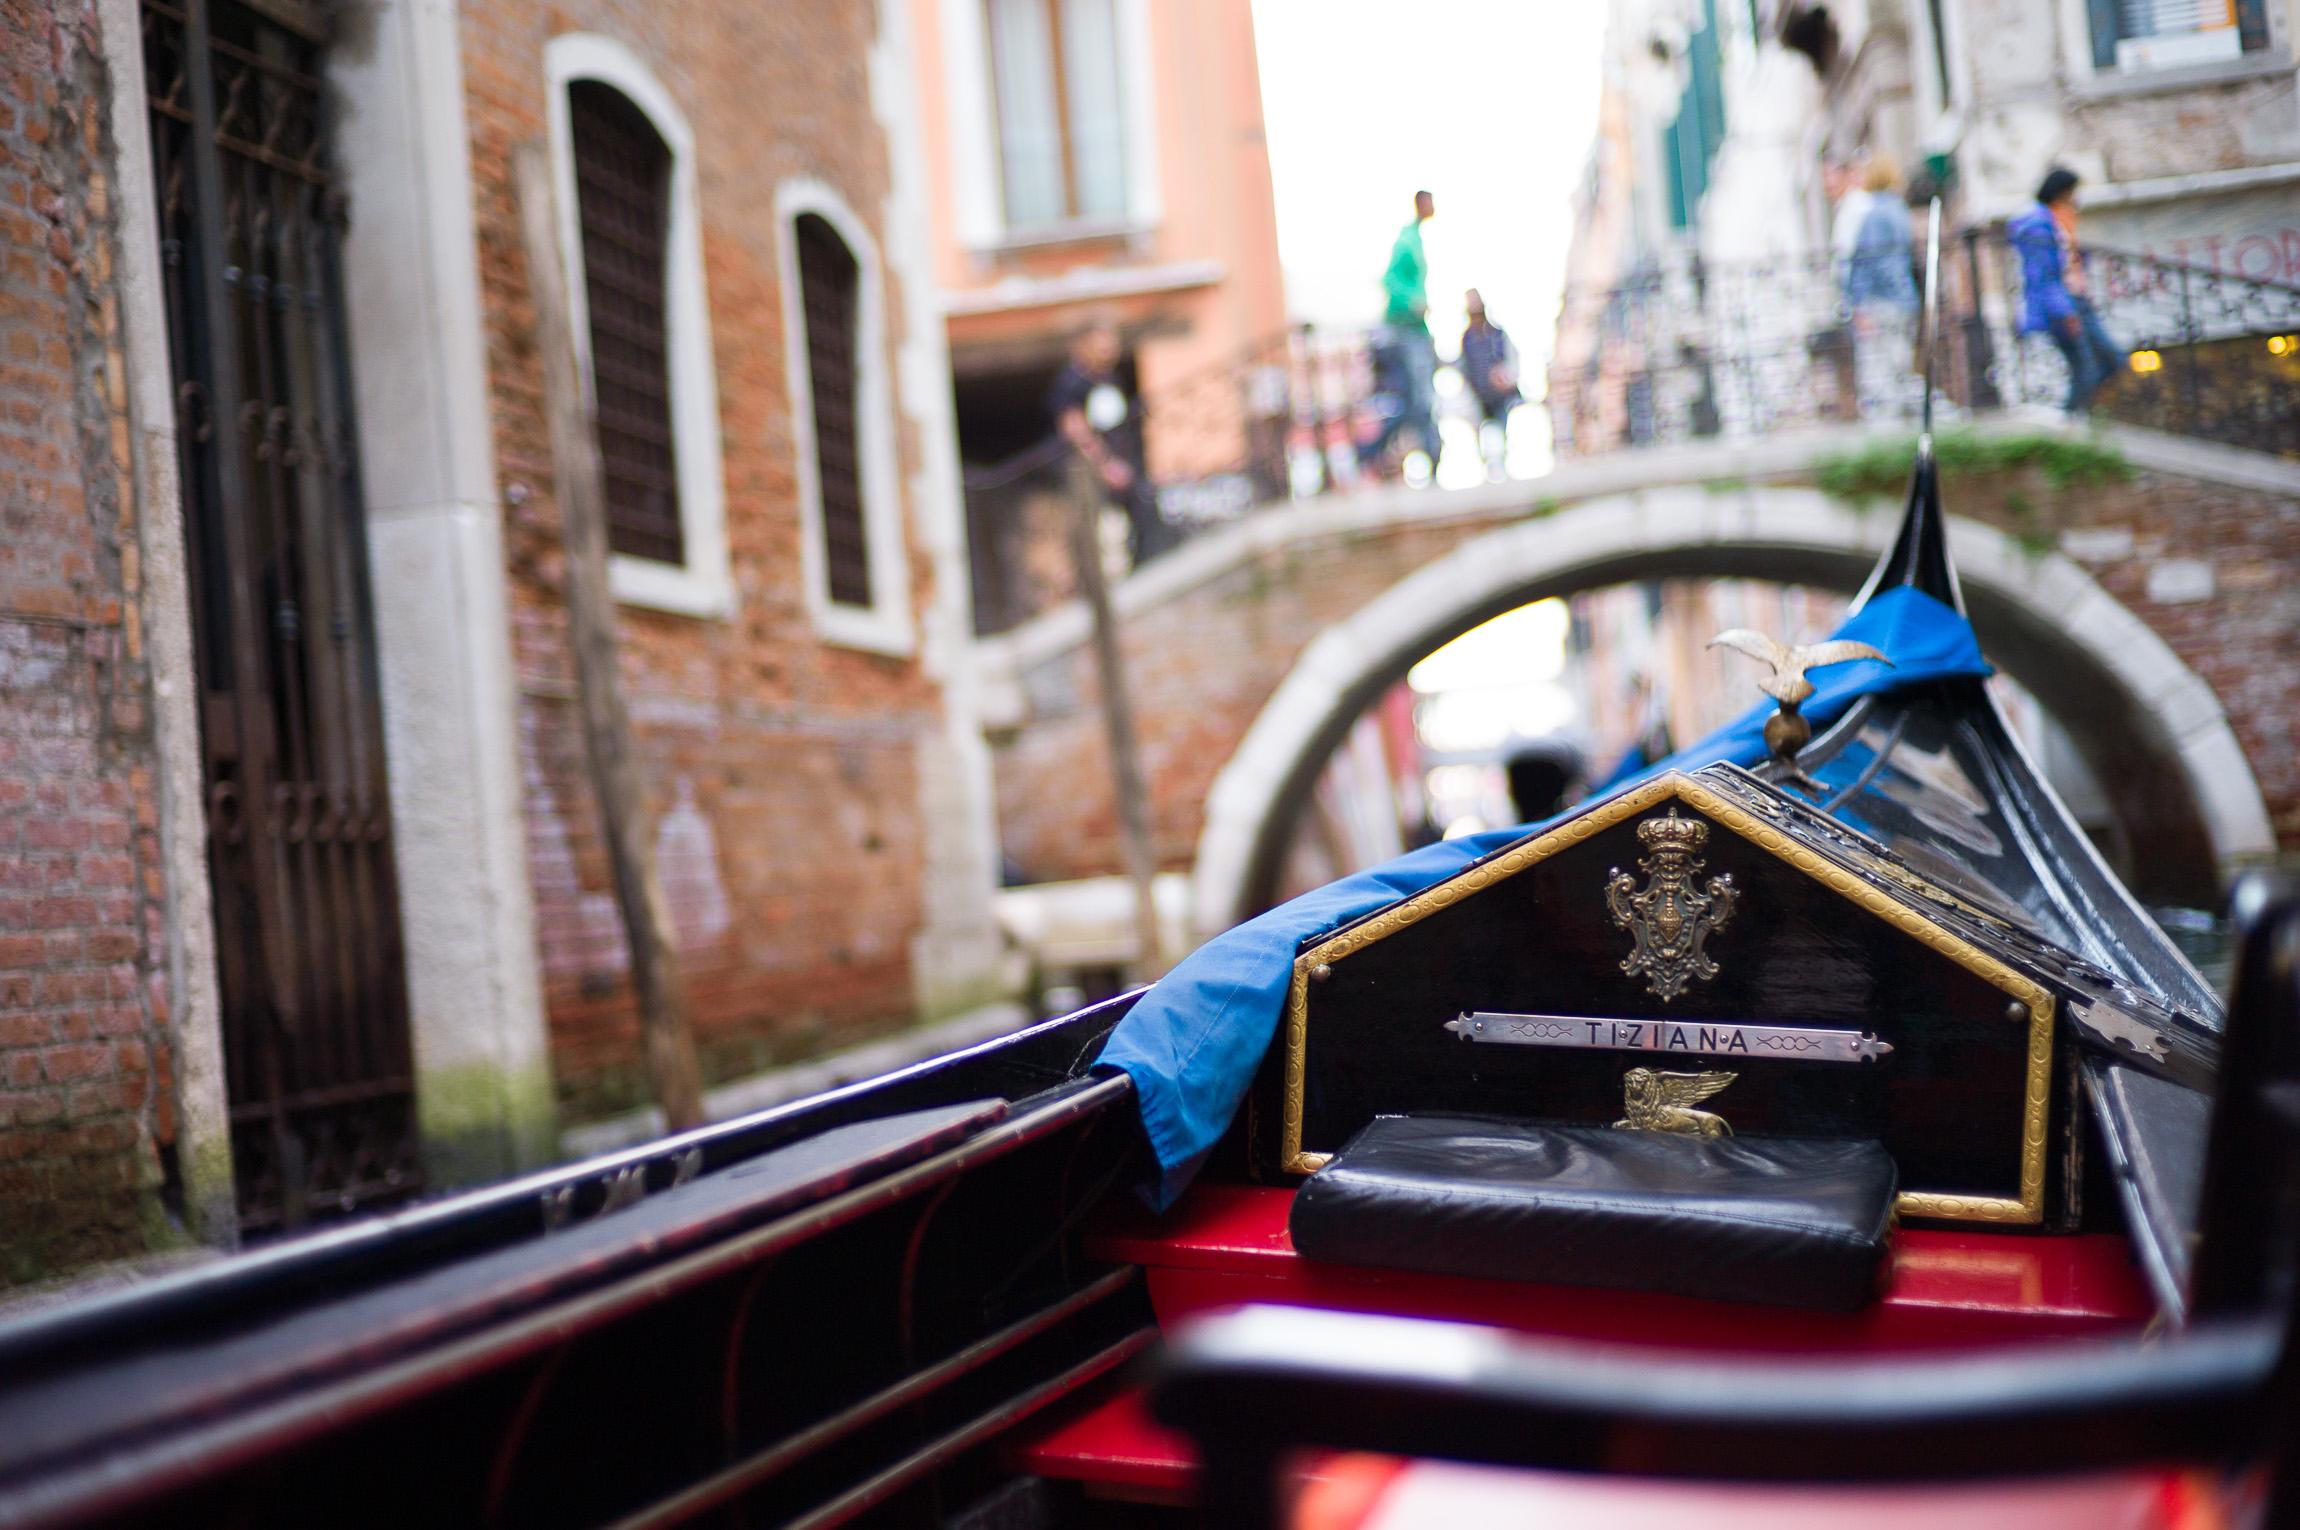 Our Gondola Ride, Venice, Italy